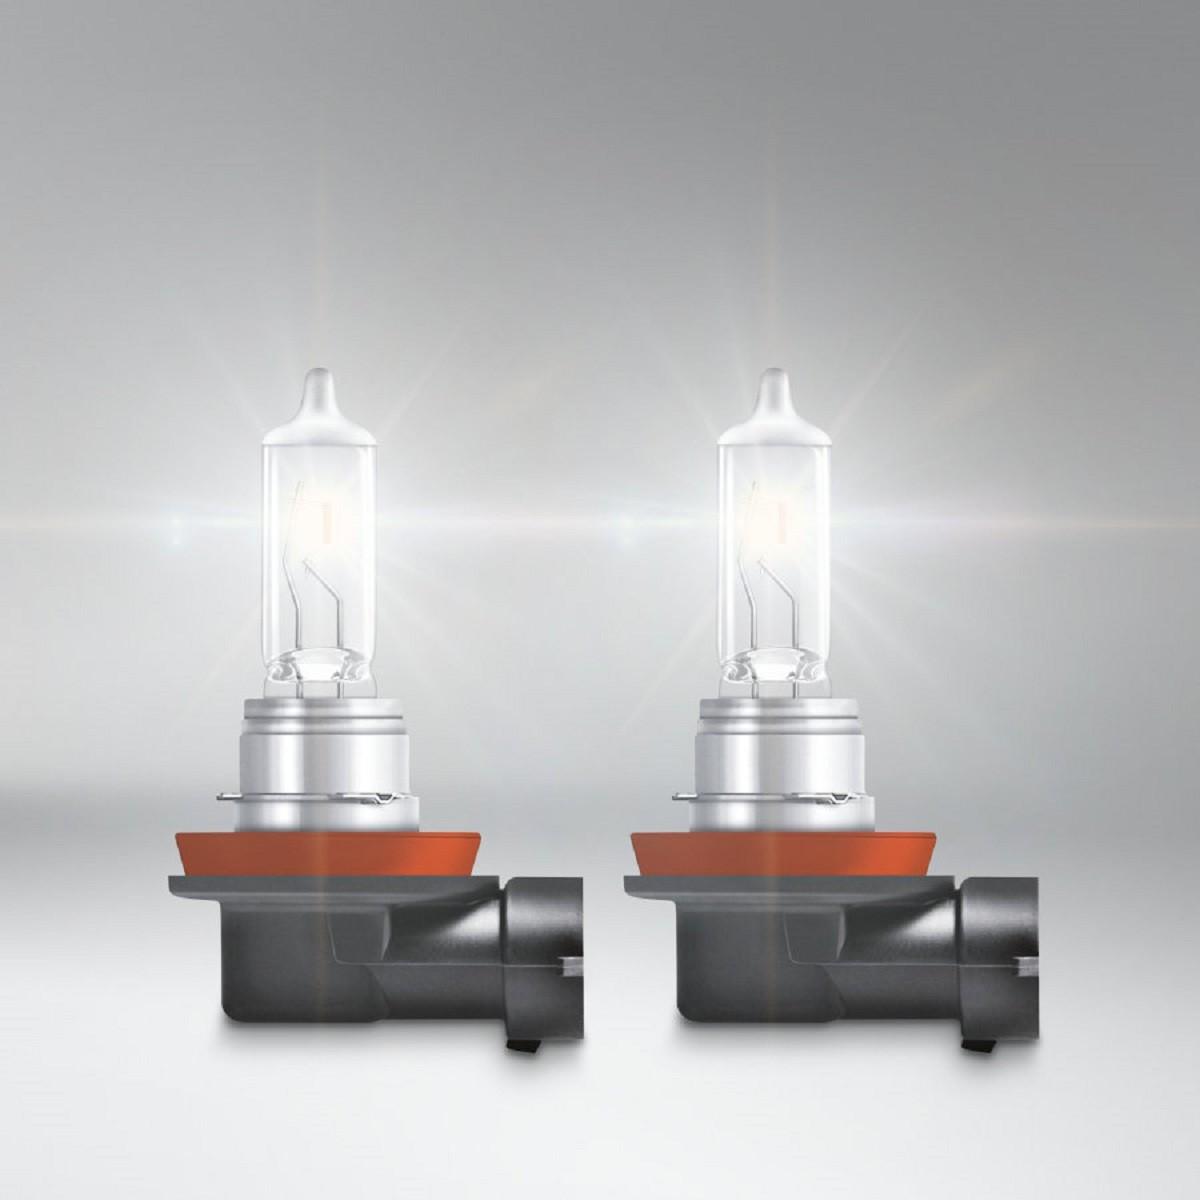 Lampada Farol Osram Night Breaker Silver Par H11 100% + Luz   - Rea Comércio - Sua Loja Completa!